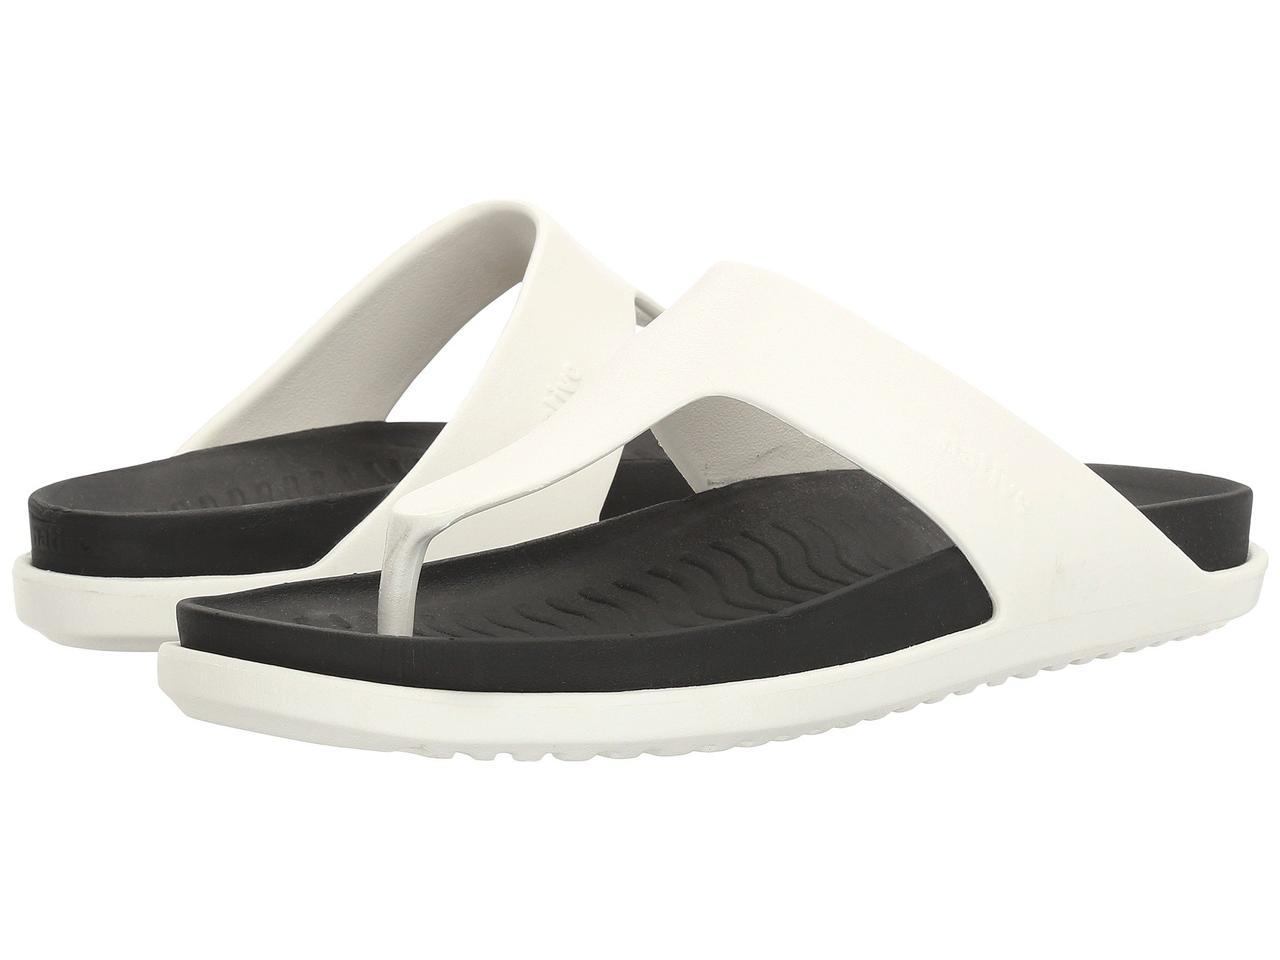 Сандали/Вьетнамки (Оригинал) Native Shoes Turner LX Shell White/Jiffy Black